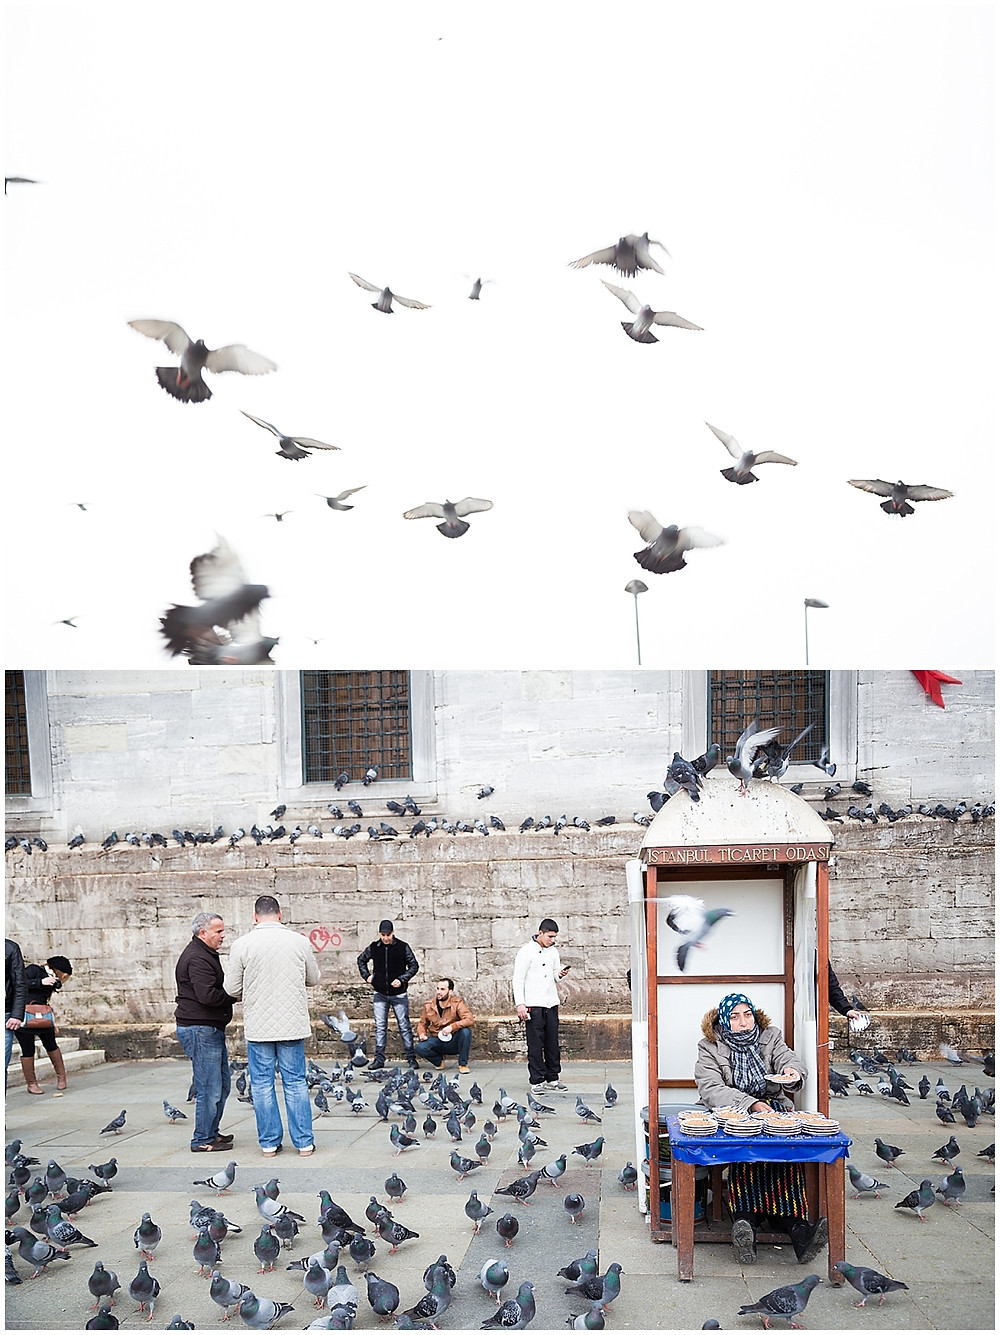 Istanbul, Turkey | Travel_0020.jpg